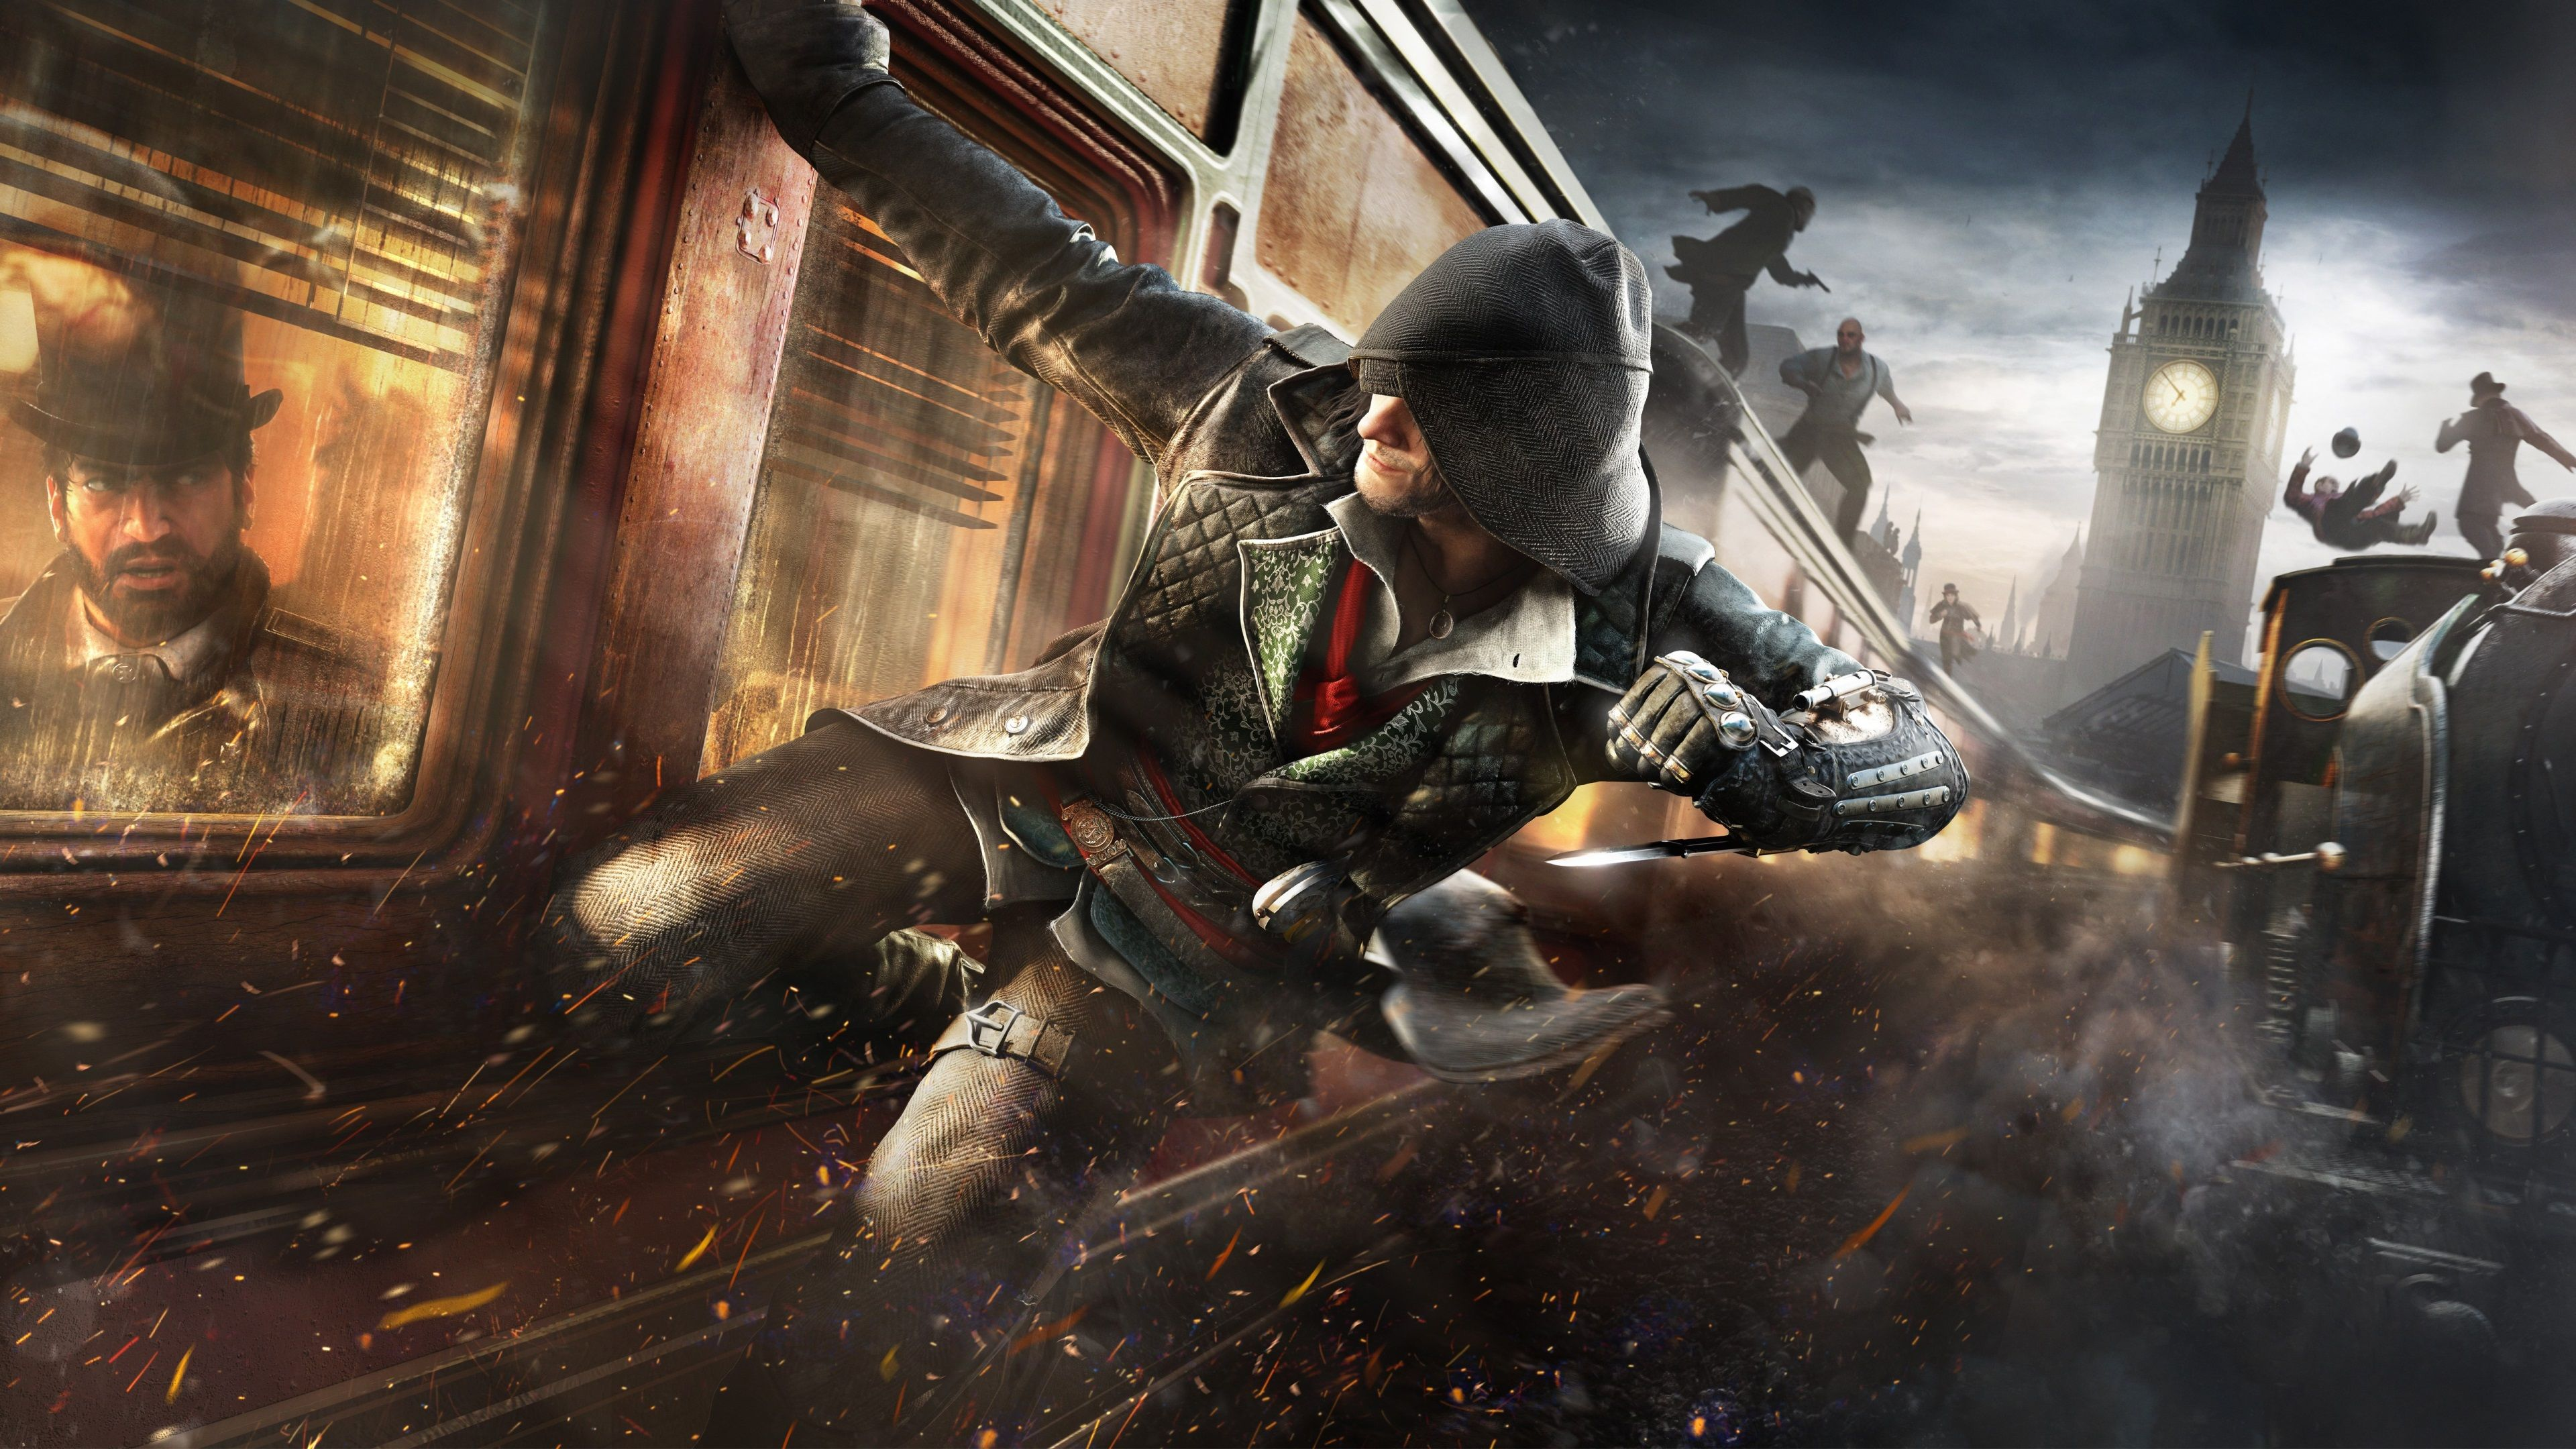 3840x2160 Assassins Creed 4k Wallpaper Download Hd Assassins Creed Game Assassins Creed Assassins Creed Syndicate